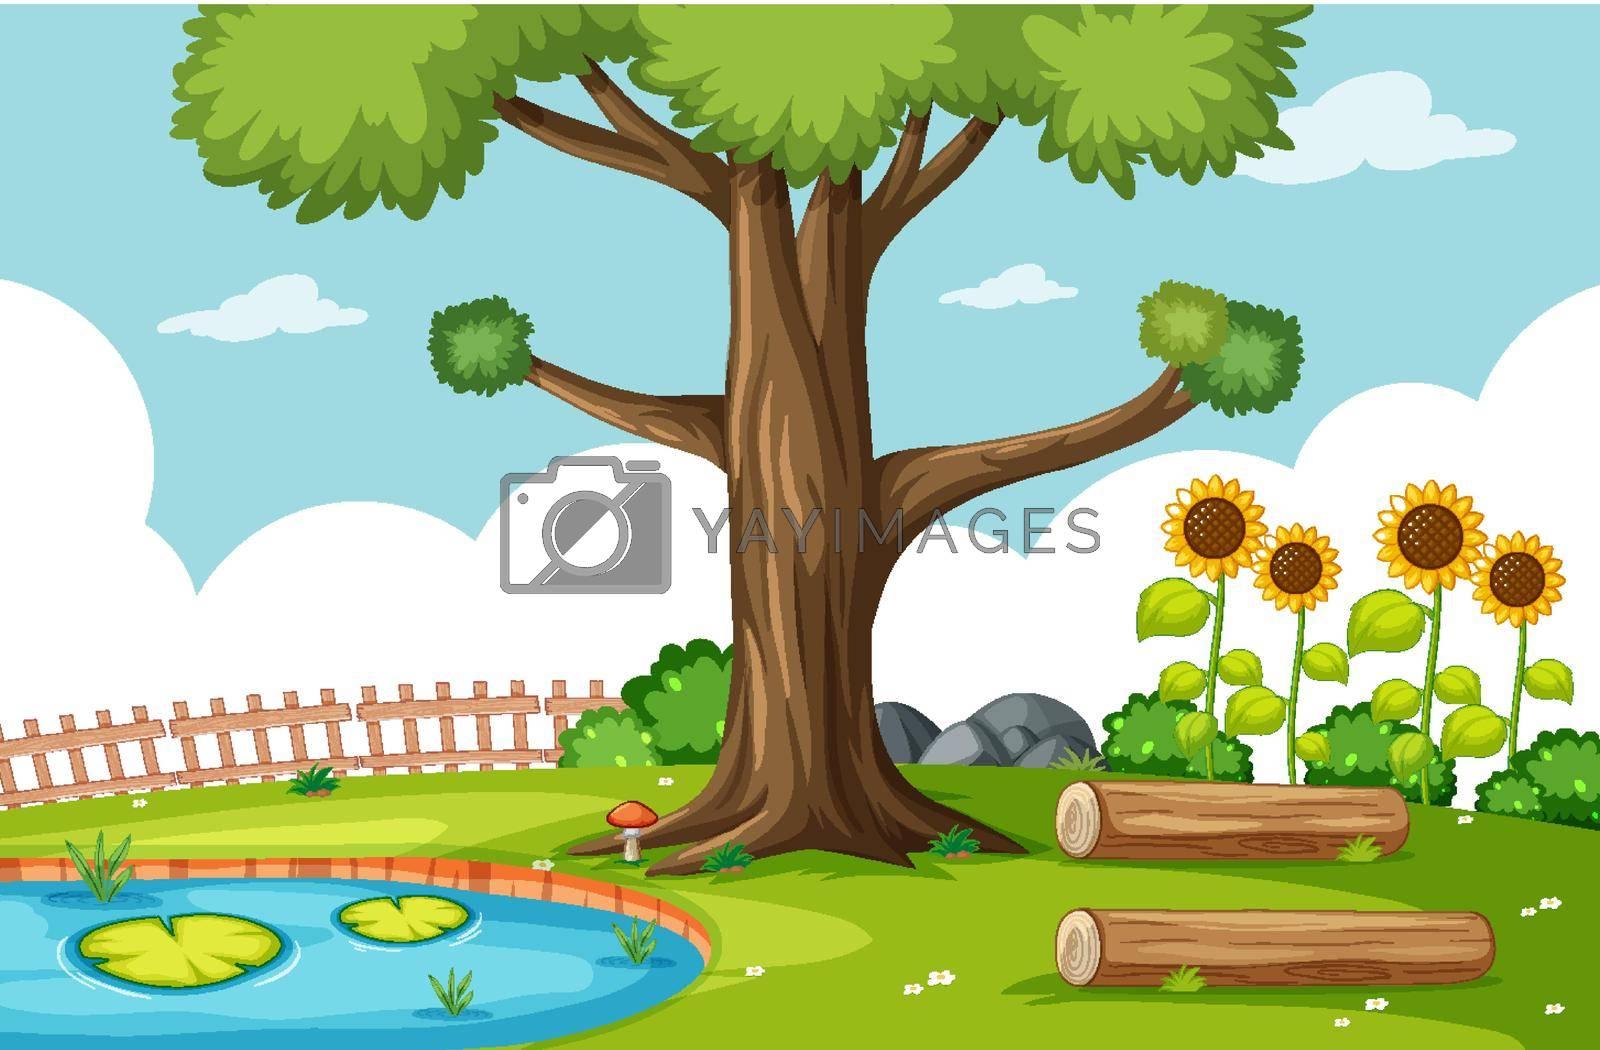 Nature park scene with swamp and sunflower scene illustration